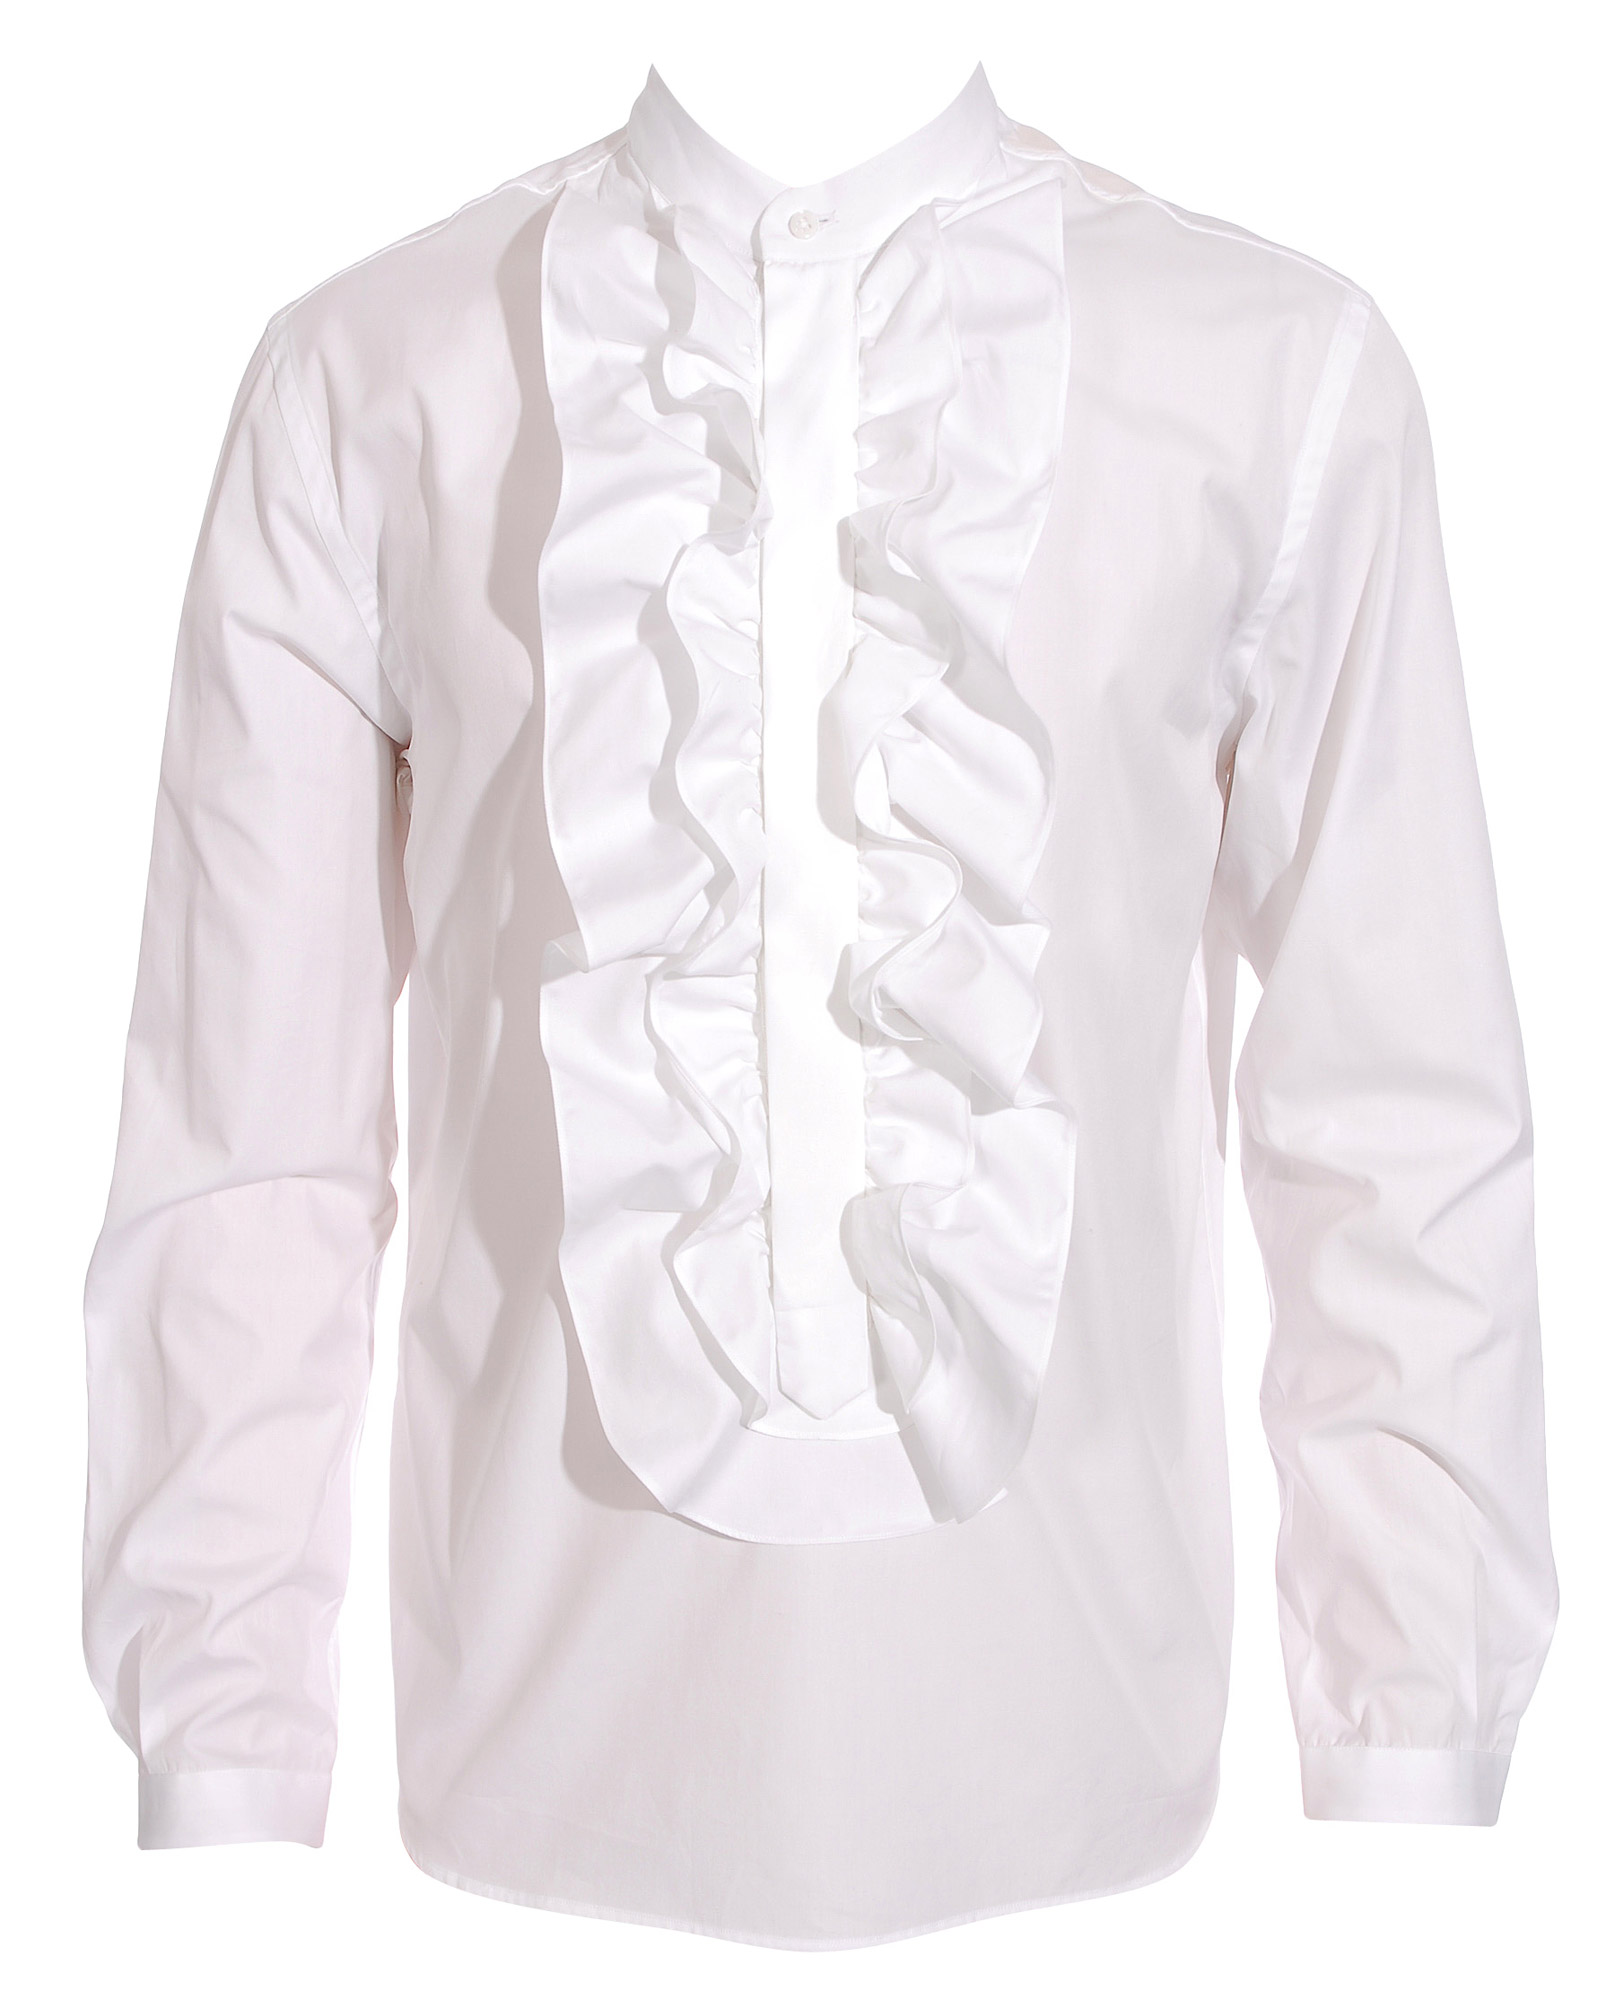 Umit Benan Ruffle Front Shirt In White For Men Lyst